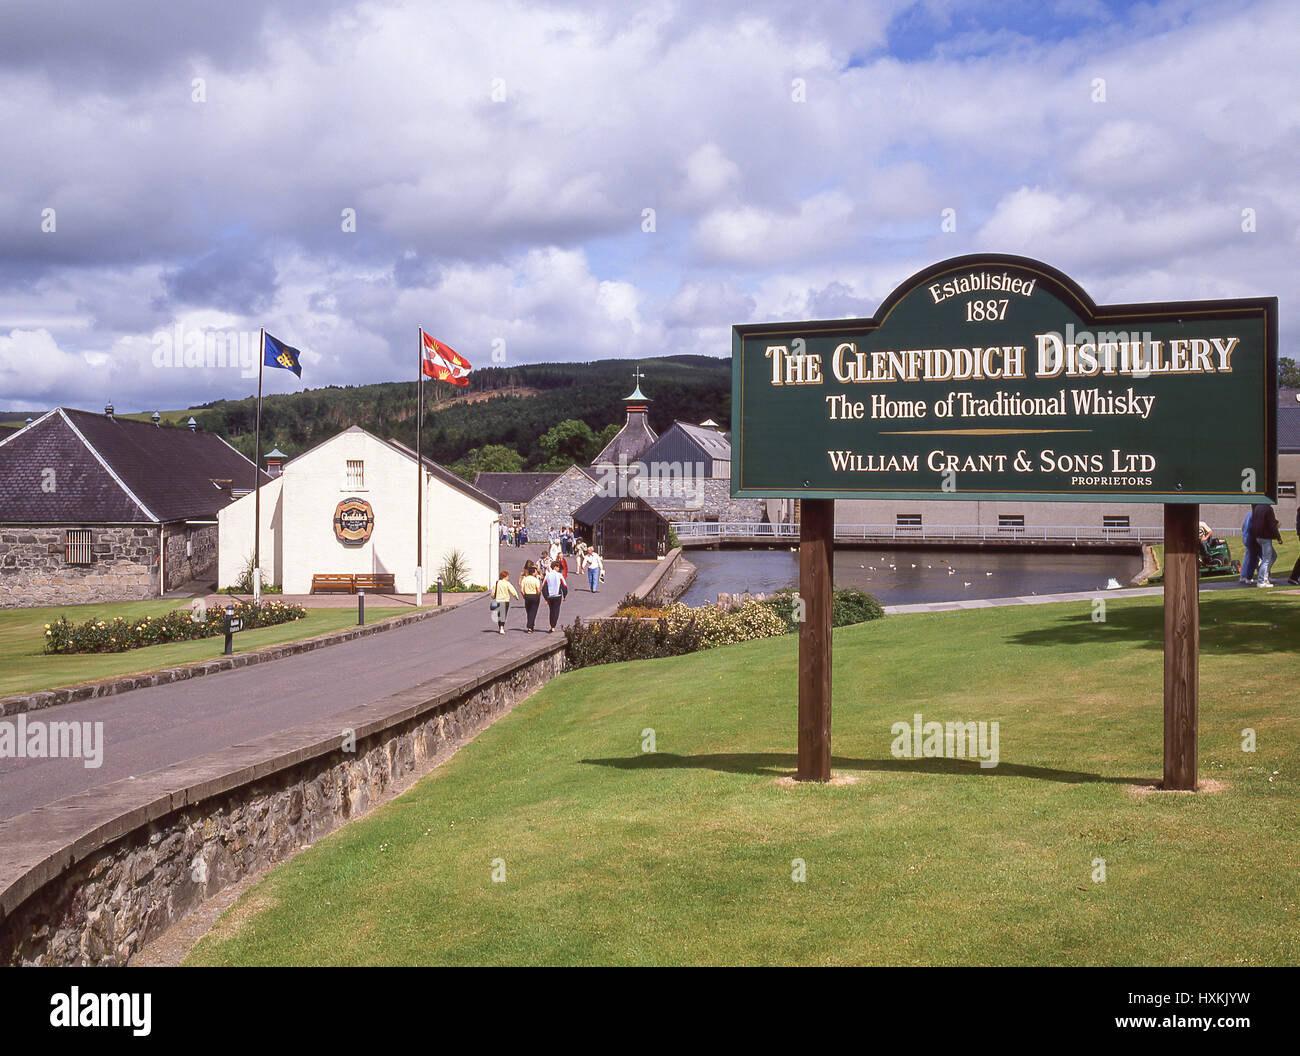 The Glenfiddich Distillery, Dufftown, Moray, Scotland, United Kingdom - Stock Image